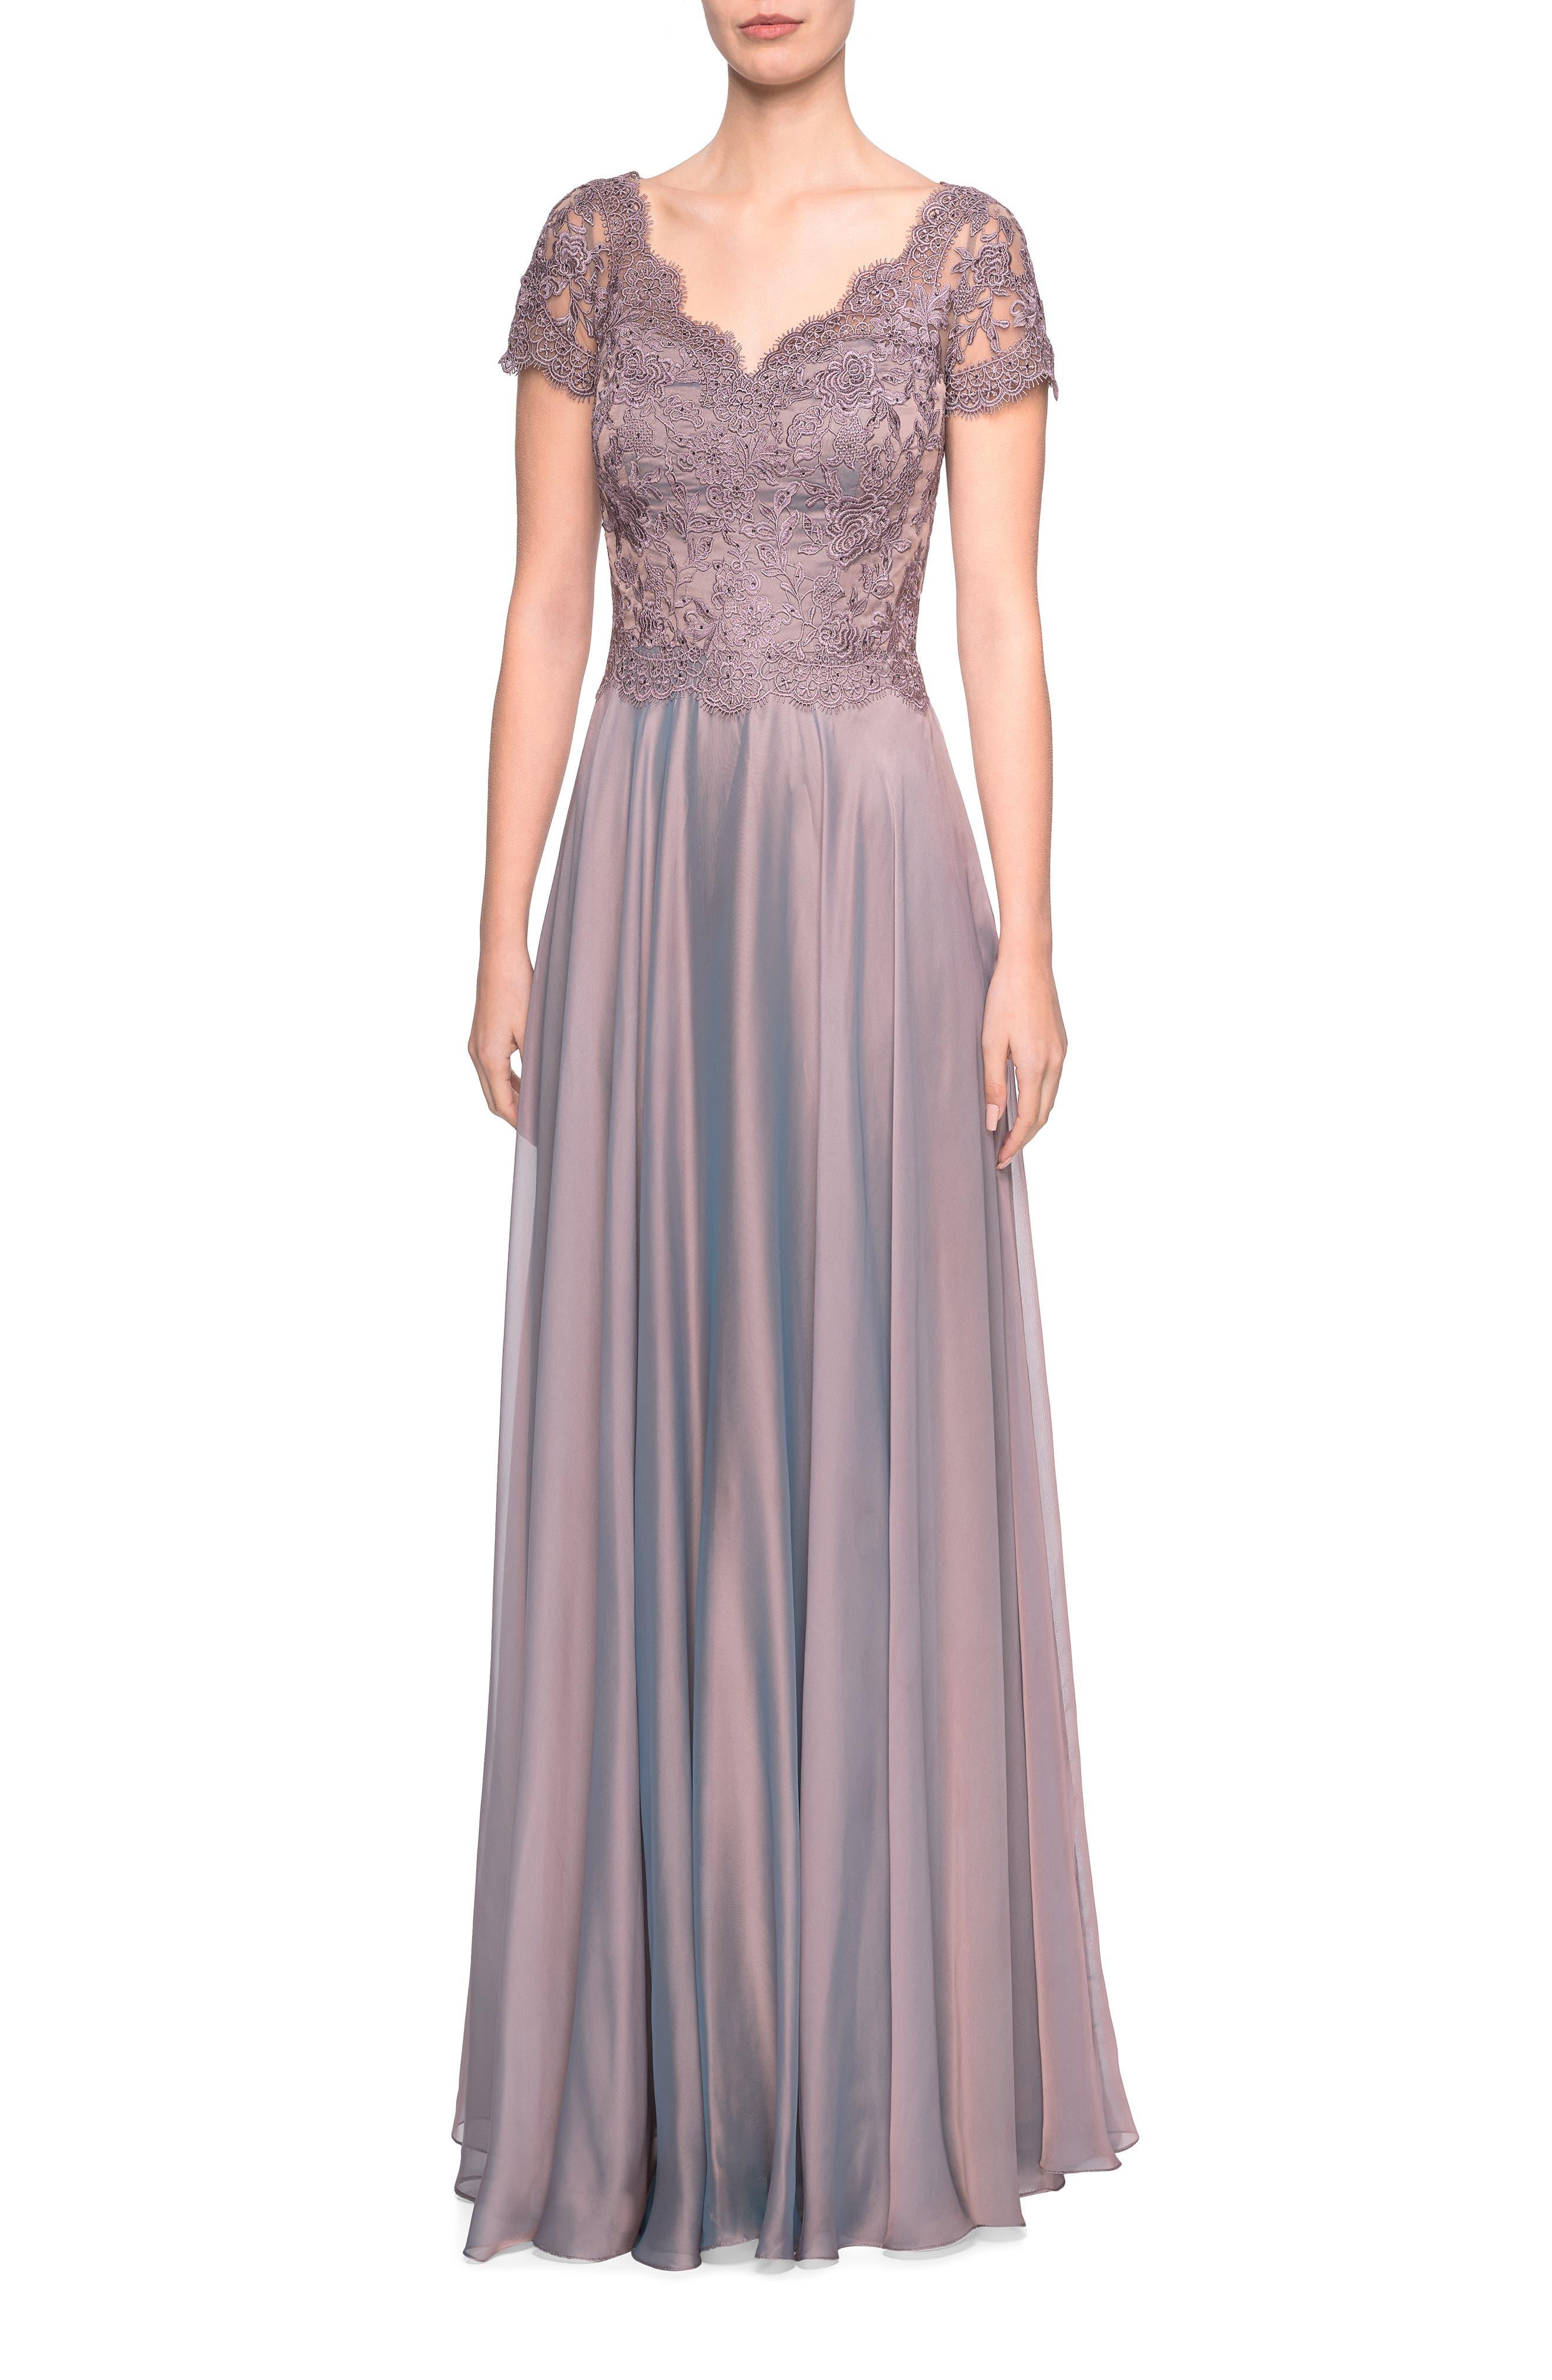 LA FEMME,                             Embroidered Lace & Chiffon Evening Dress,                             Main thumbnail 1, color,                             COCOA